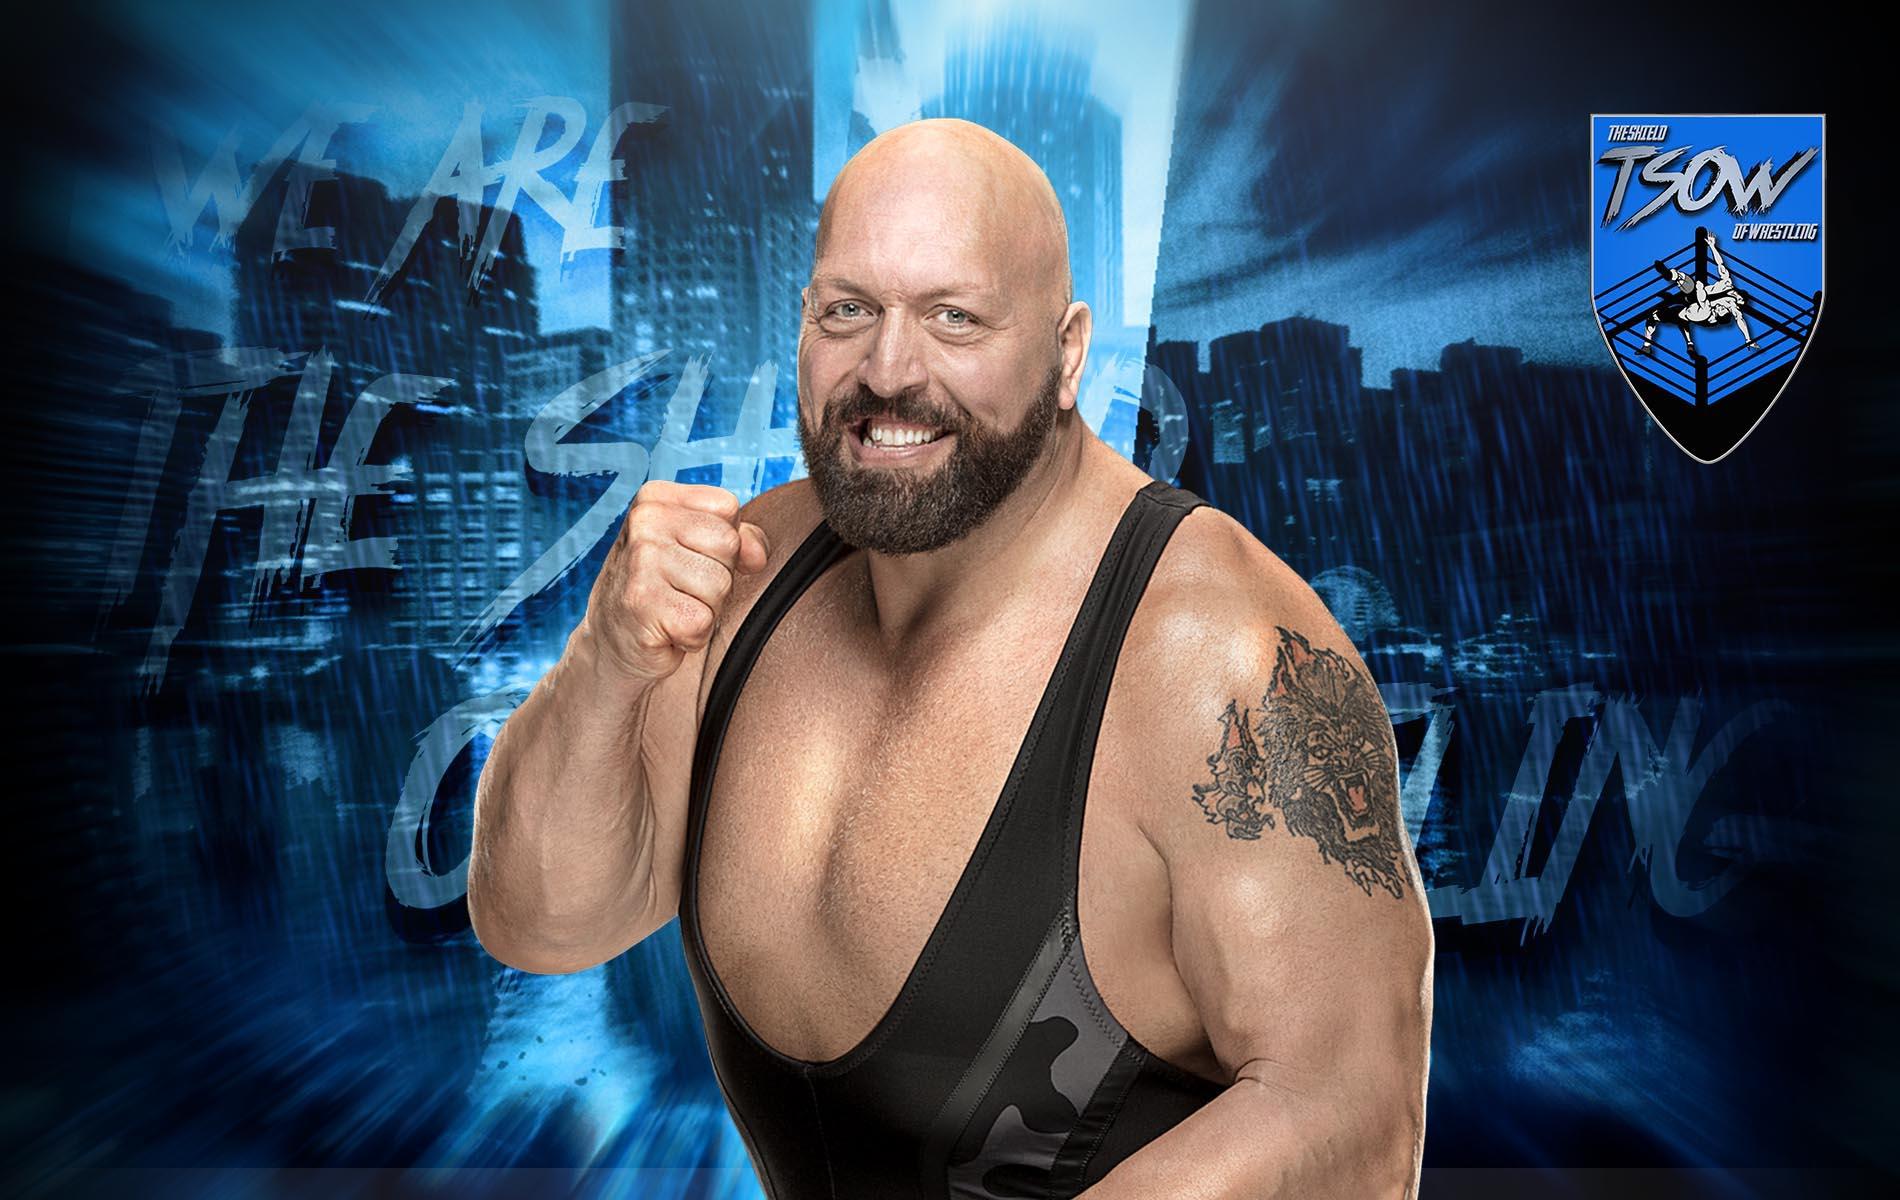 Big Show: Brock Lesnar ha contribuito alla rinascita della mia carriera